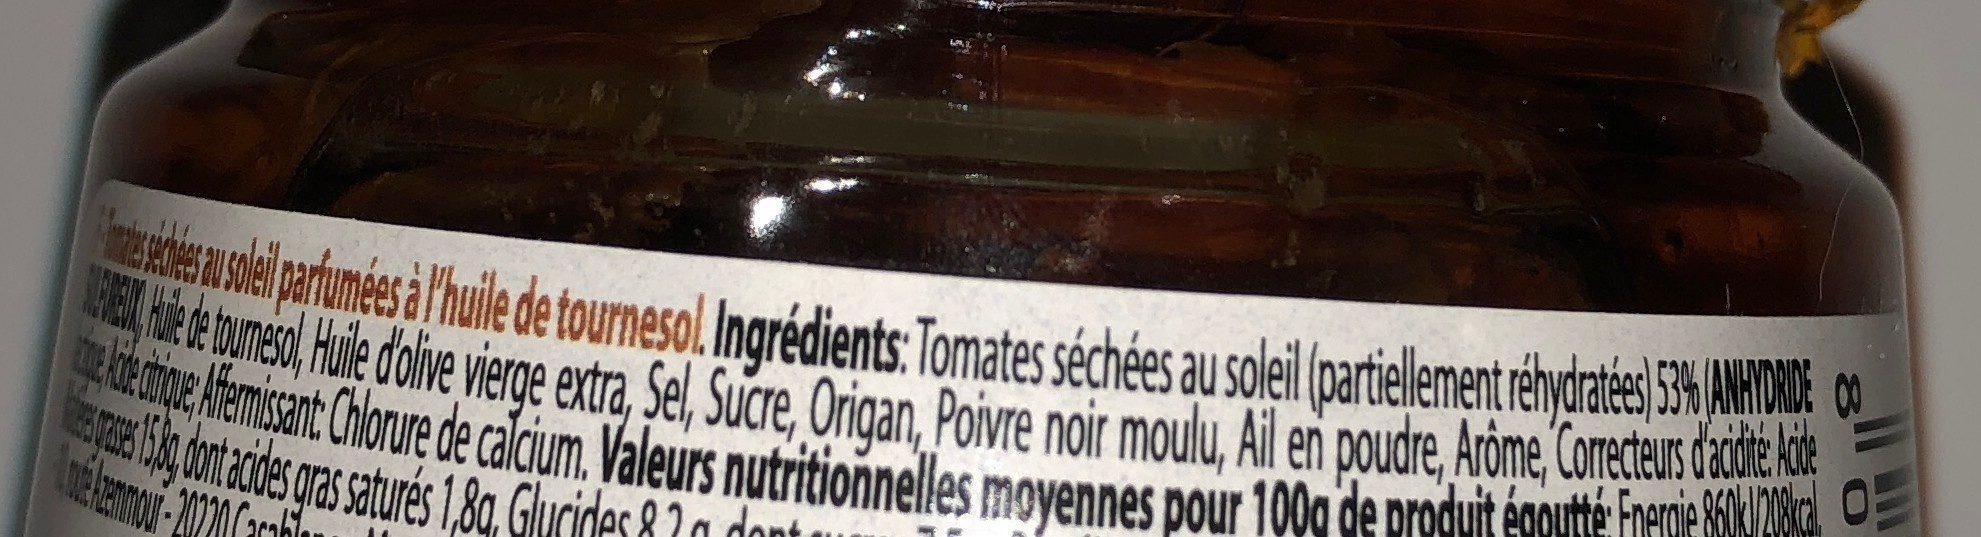 Pomodori secchi - Ingrediënten - fr